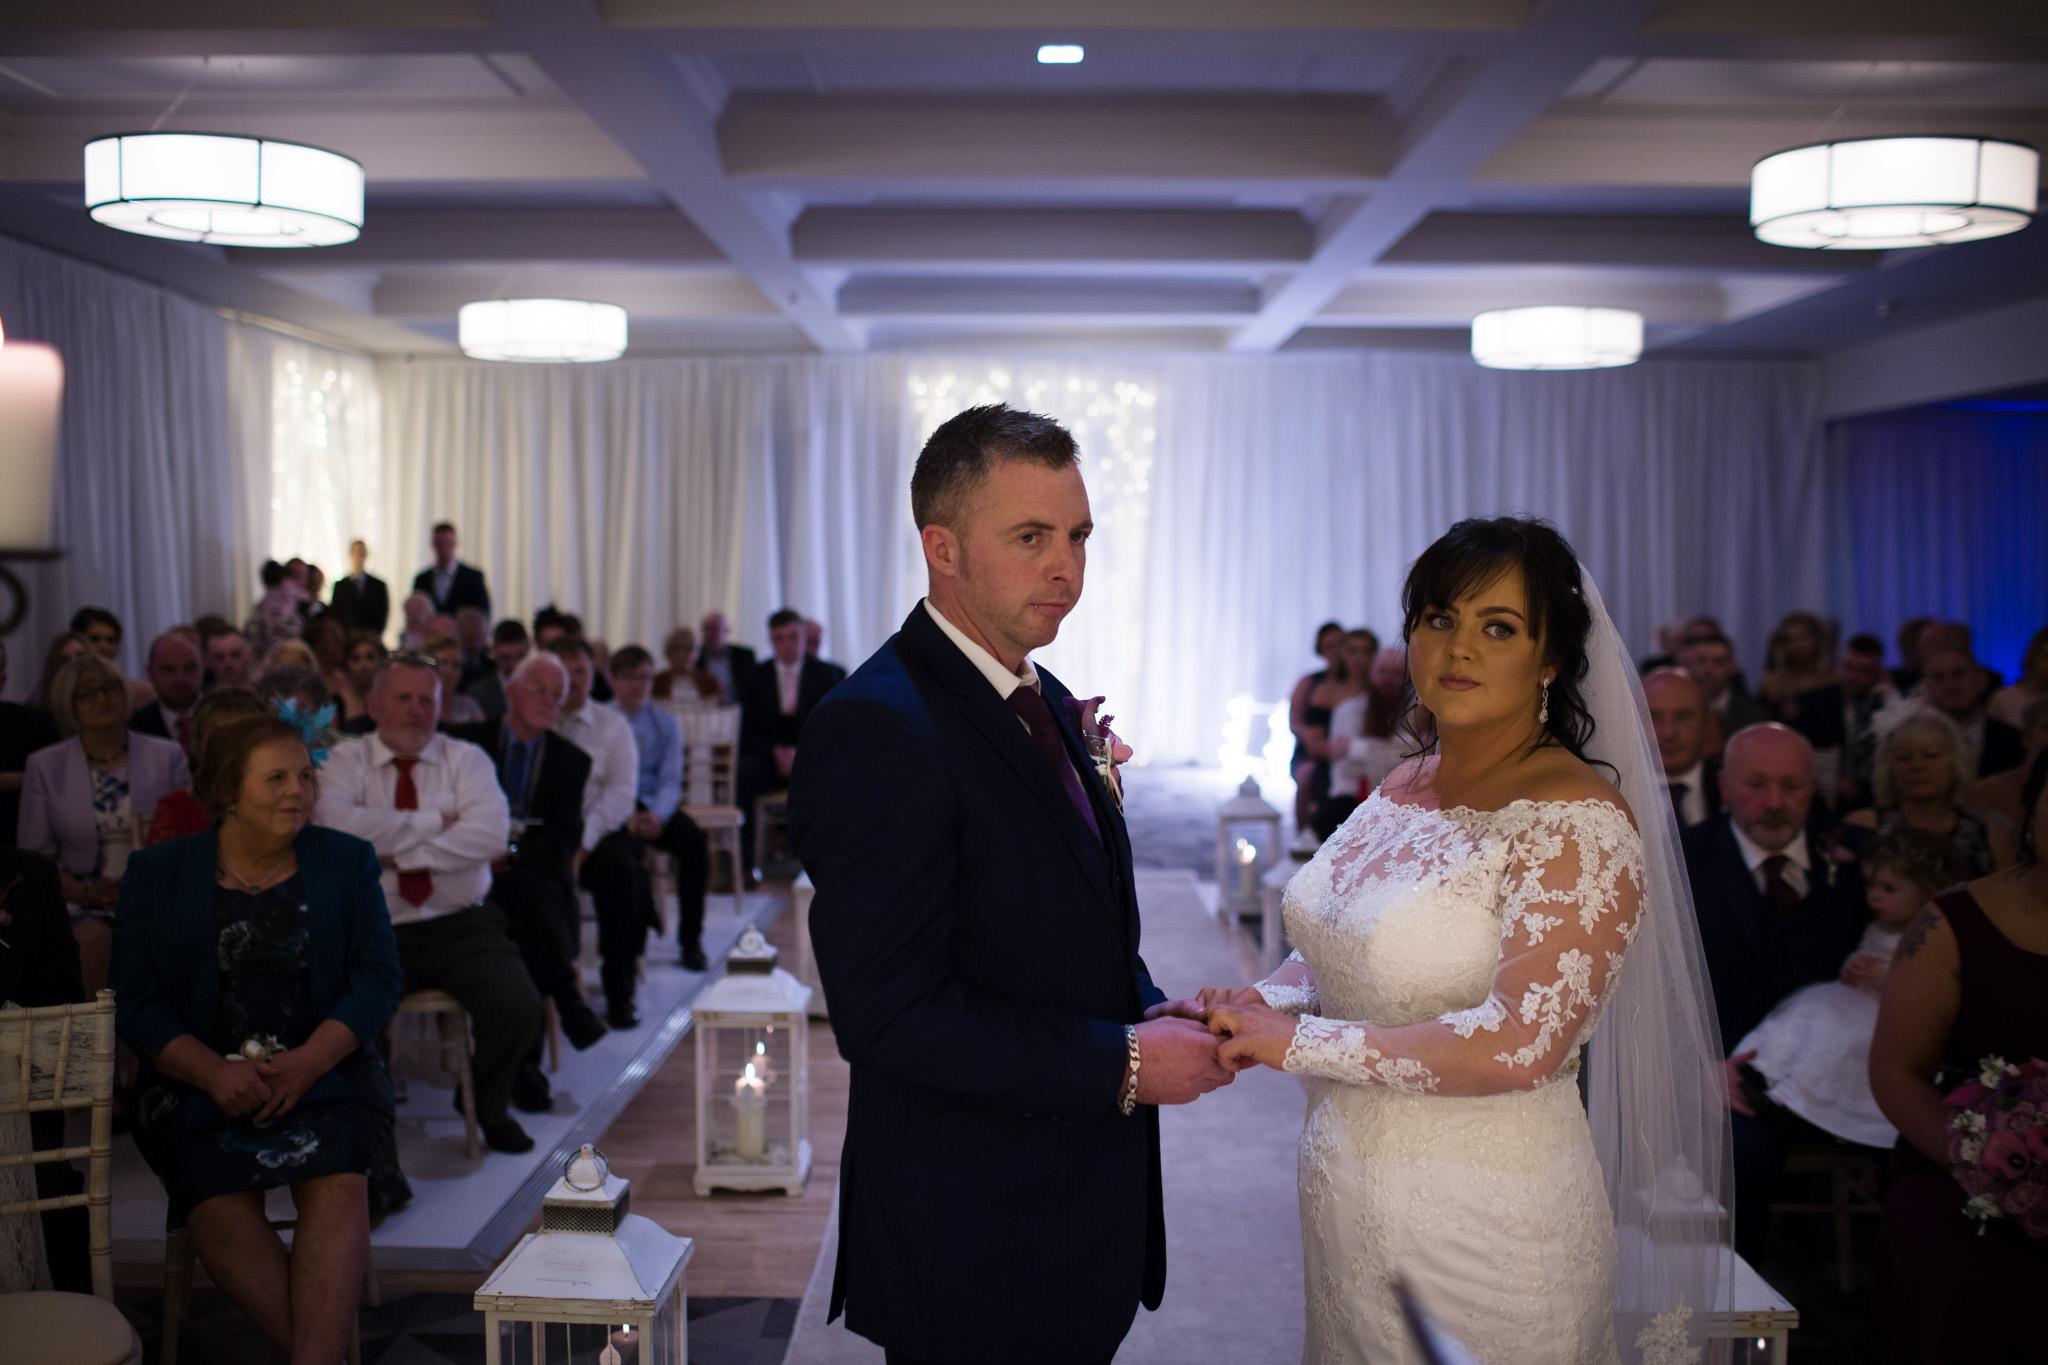 Mark_Barnes_Northern_Ireland_Wedding_Photography_Marine_hotel_ballycastle_Wedding_Photography_Janet&Darren-14.jpg